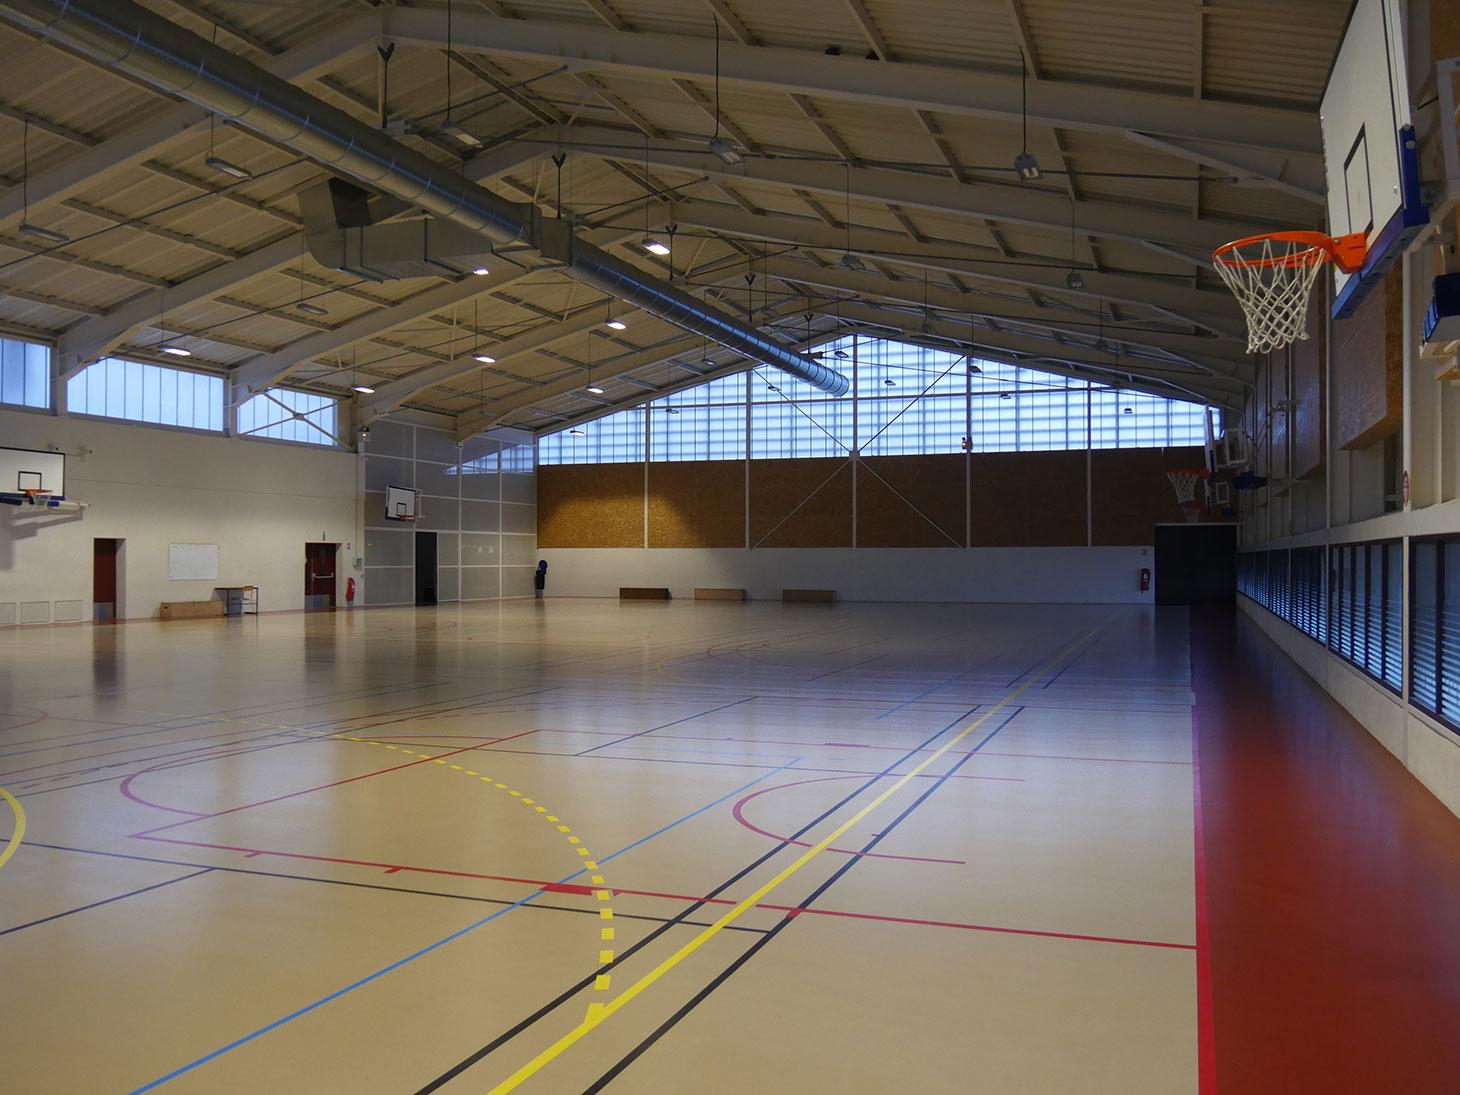 Halle sport - UFR STAPS - Grenoble